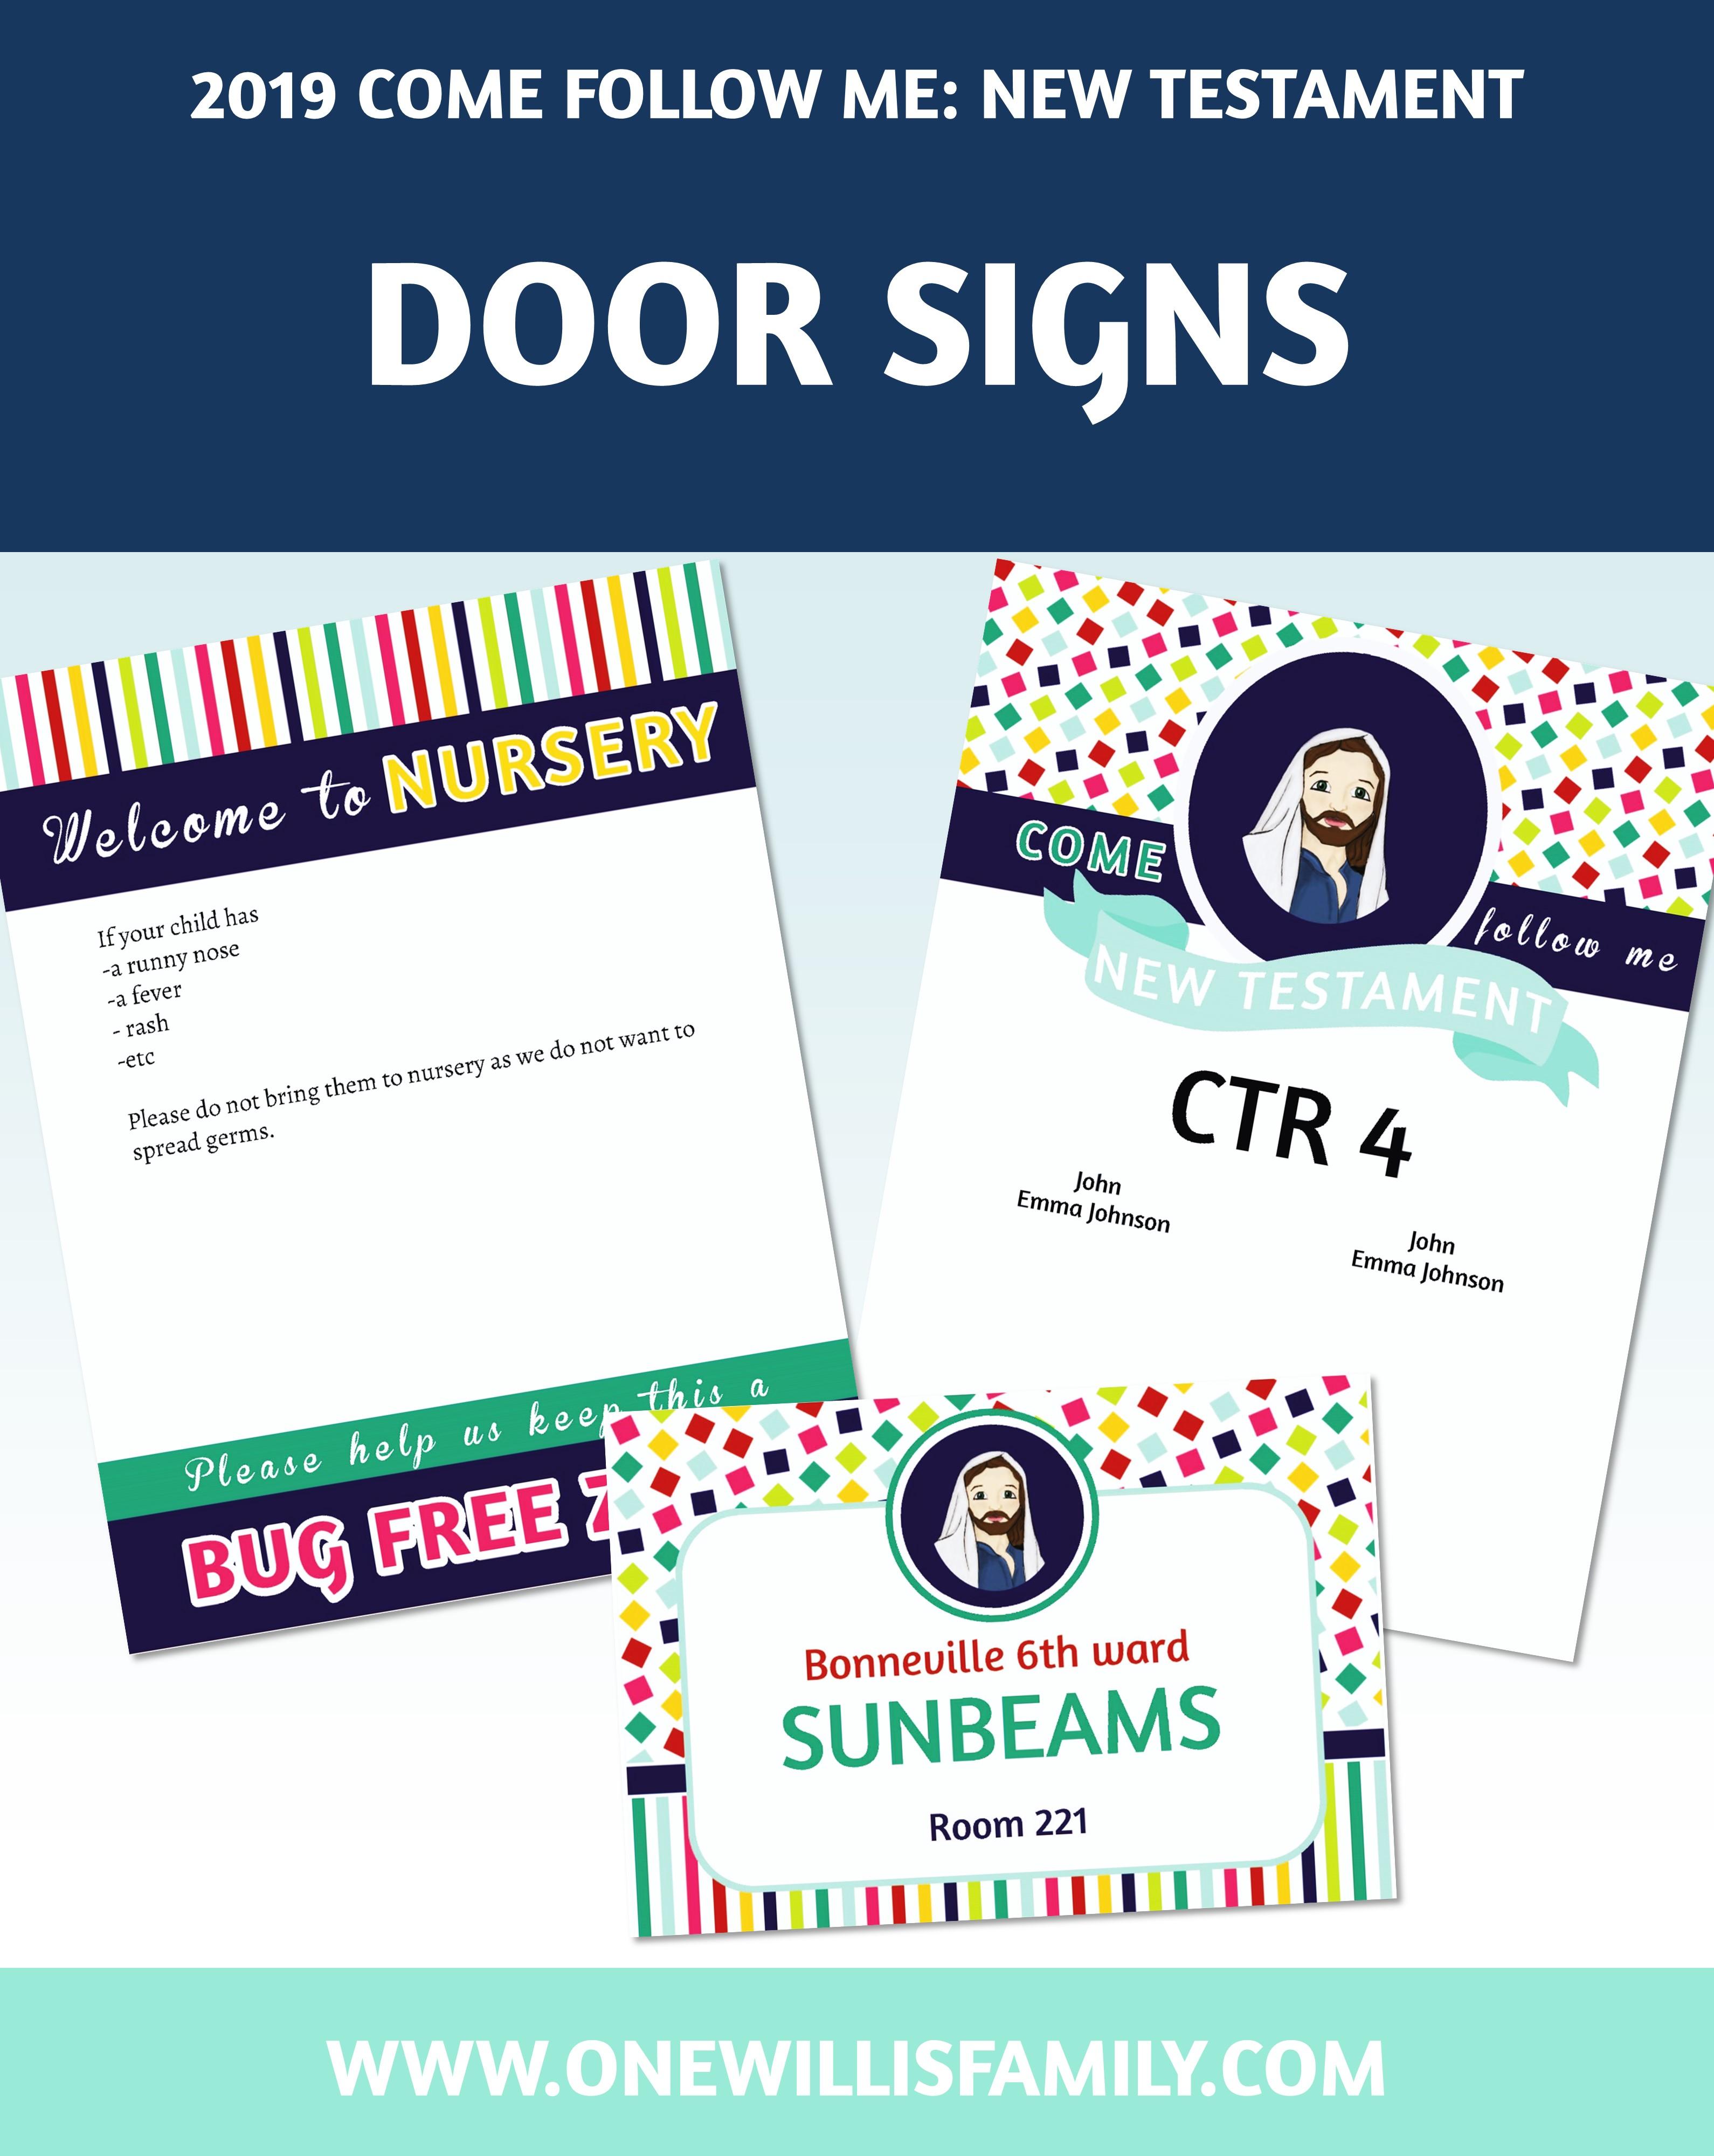 picture regarding Free Printable Door Signs named 2019 Standard Doorway Indicators with Nursery Signal